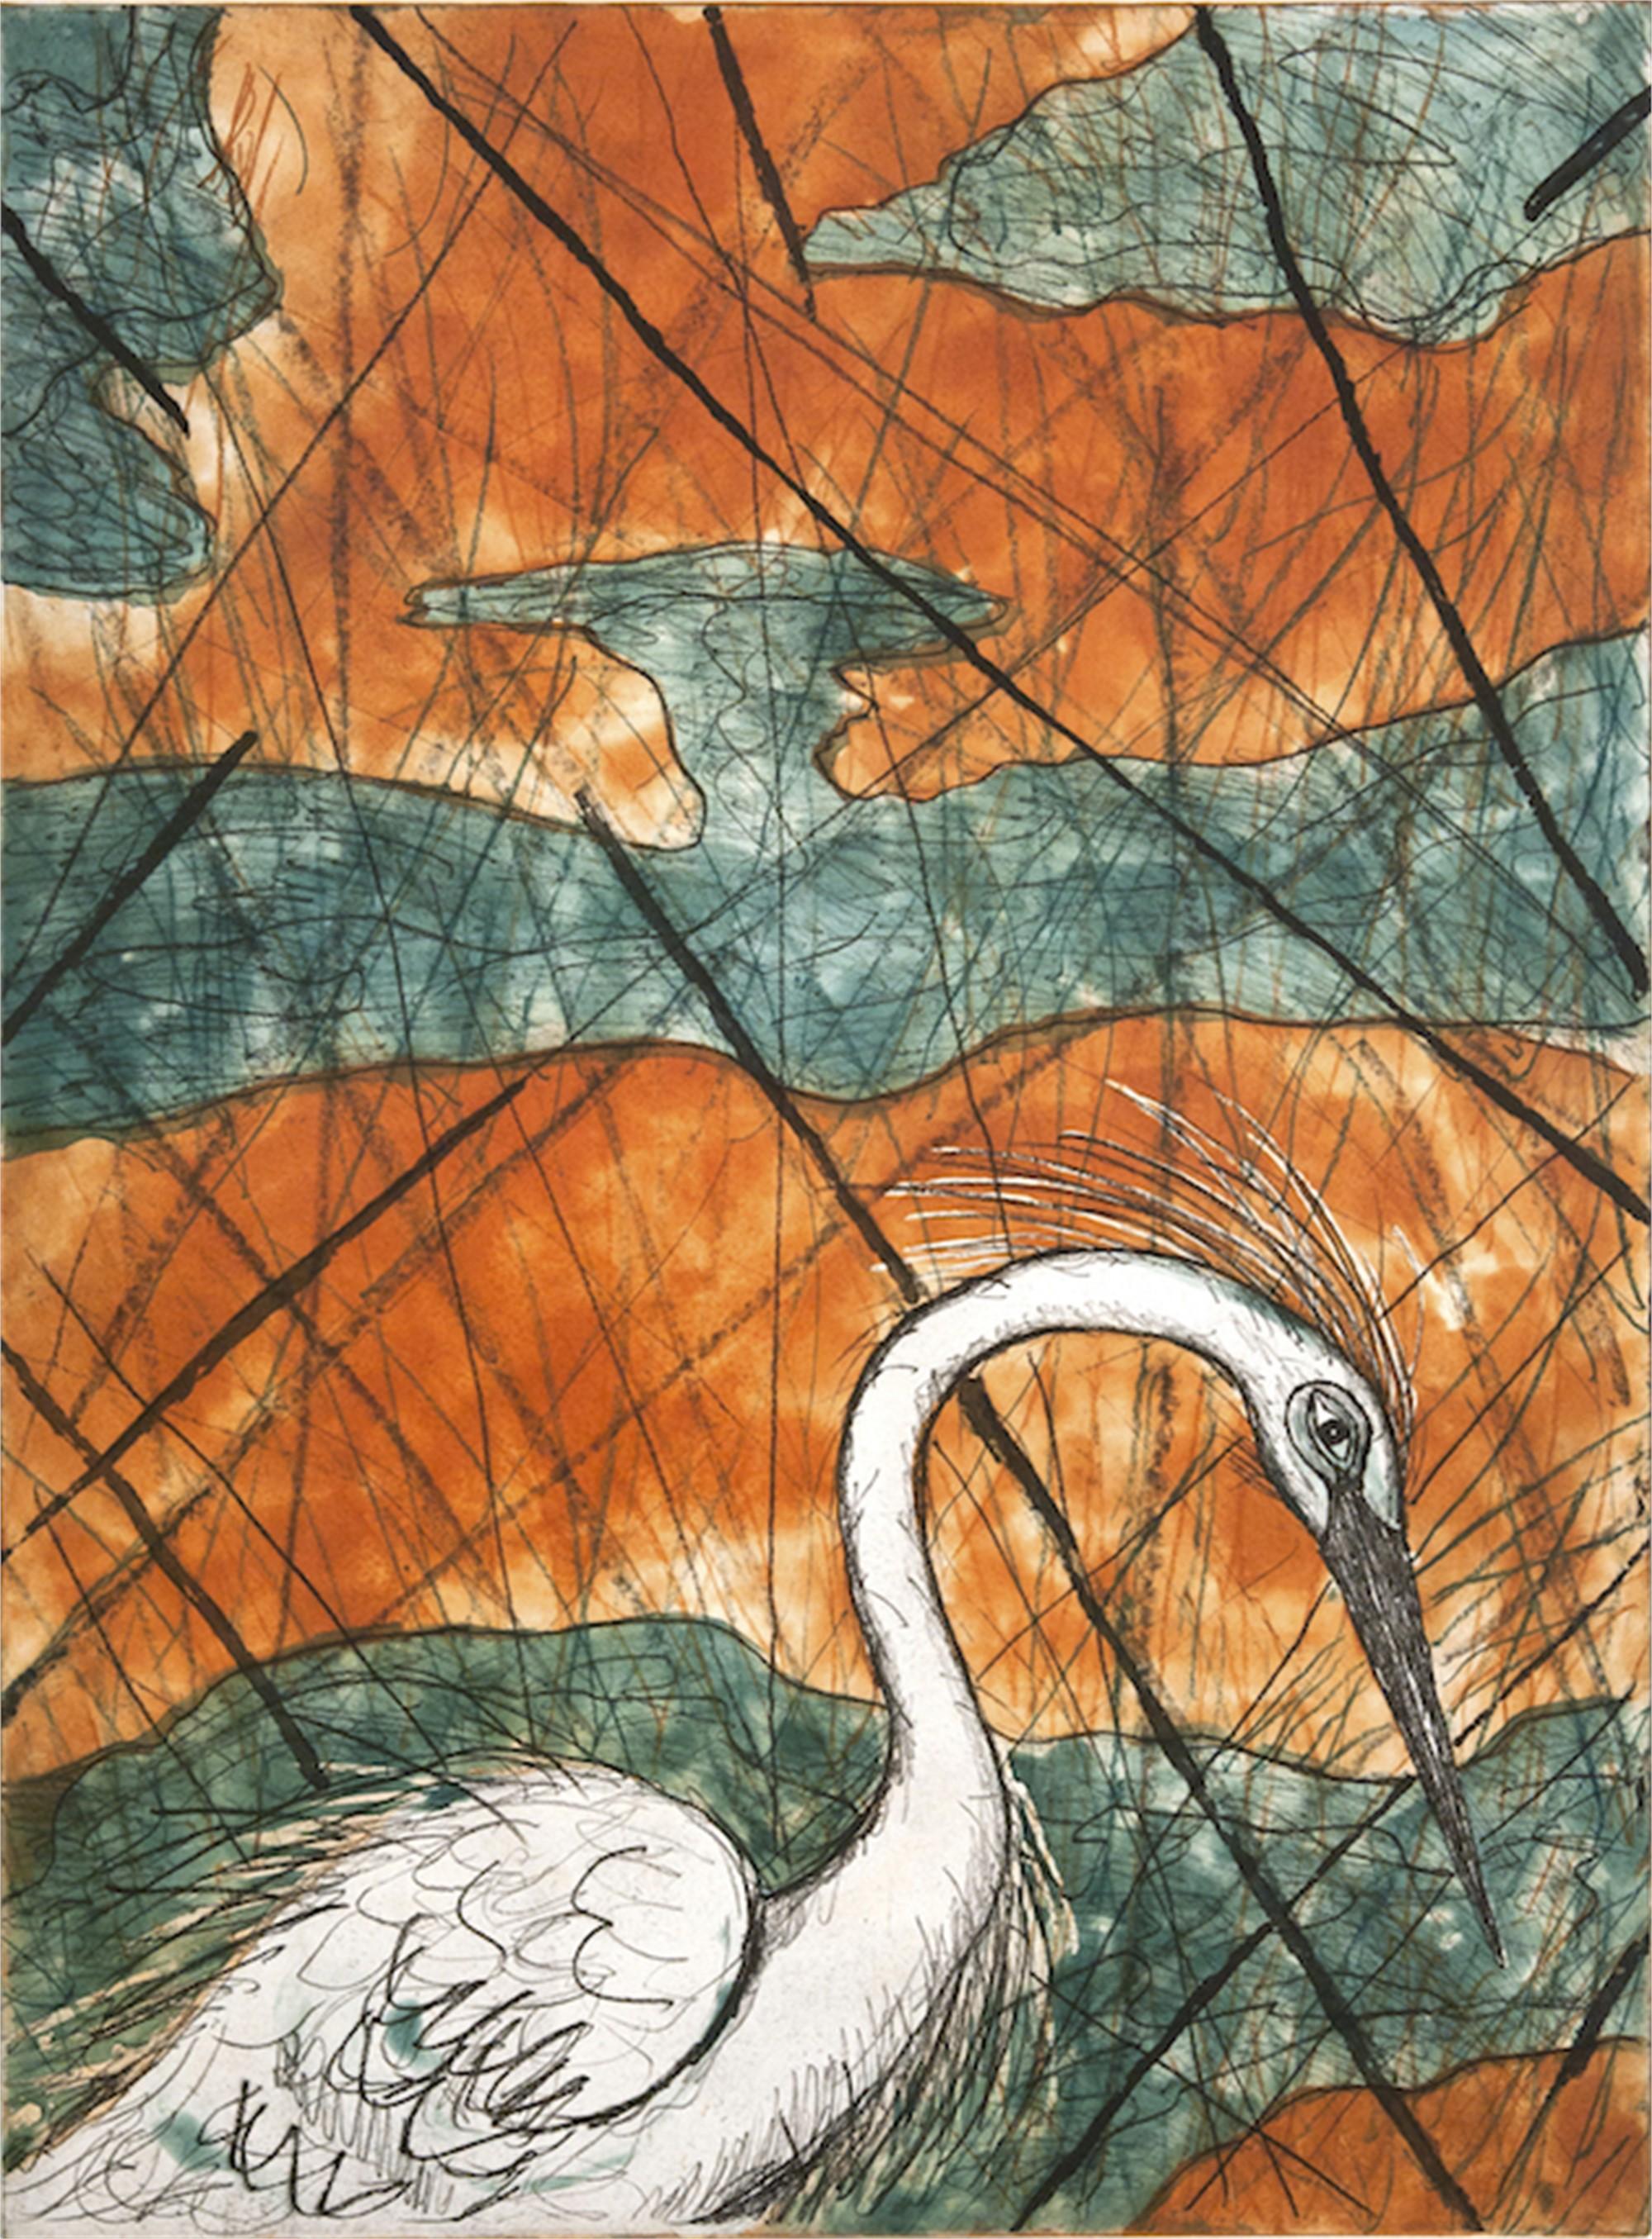 Snowy Egret by Frank X. Tolbert 2